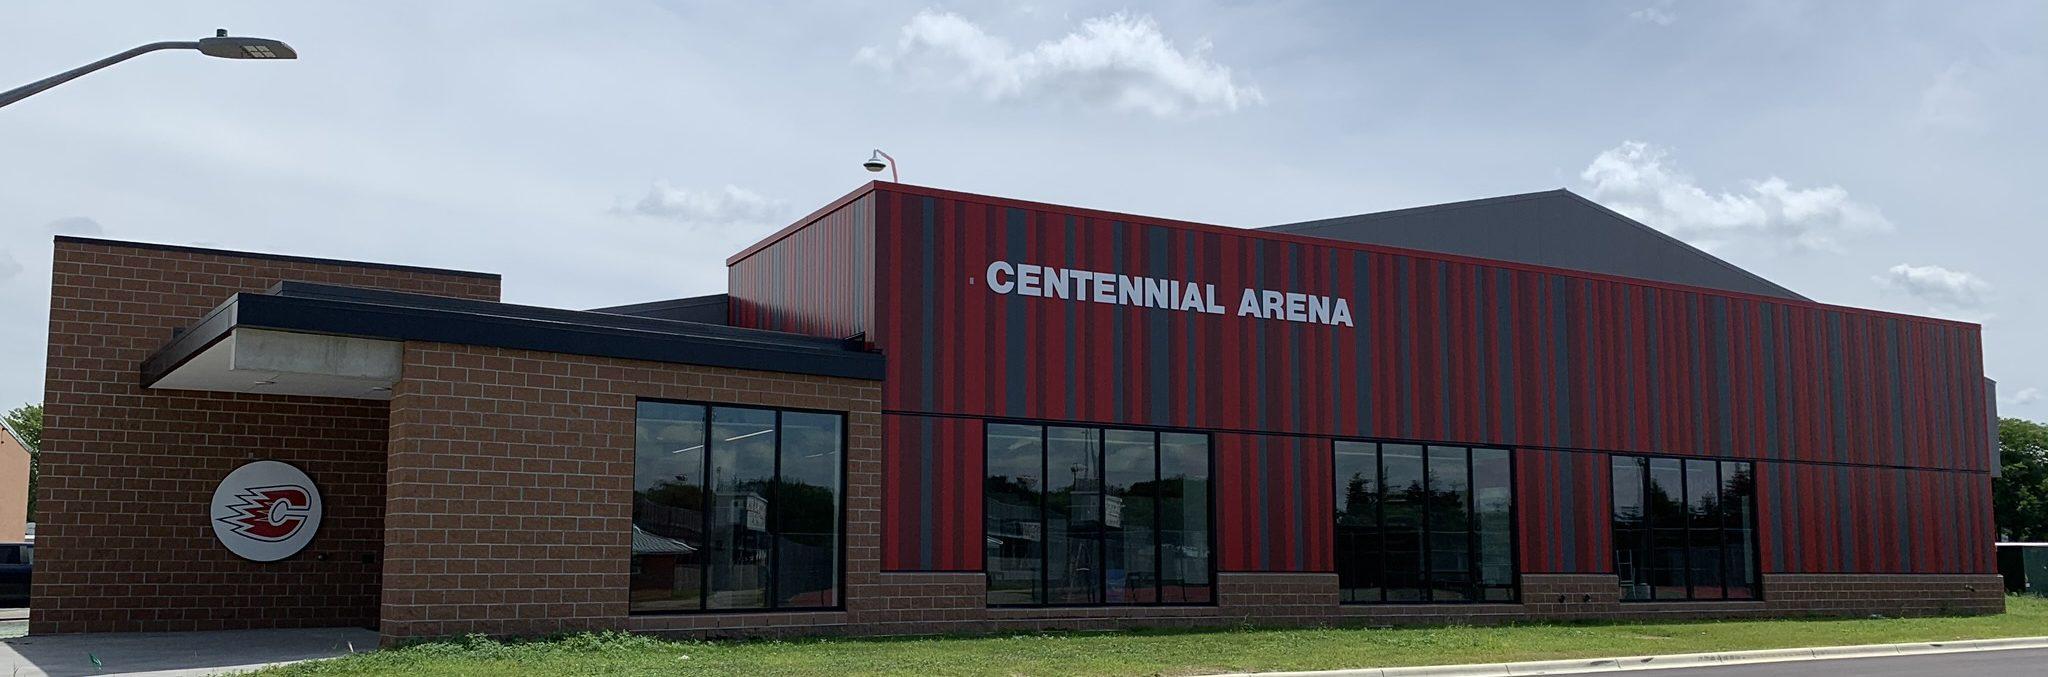 Centennial Sports Arena